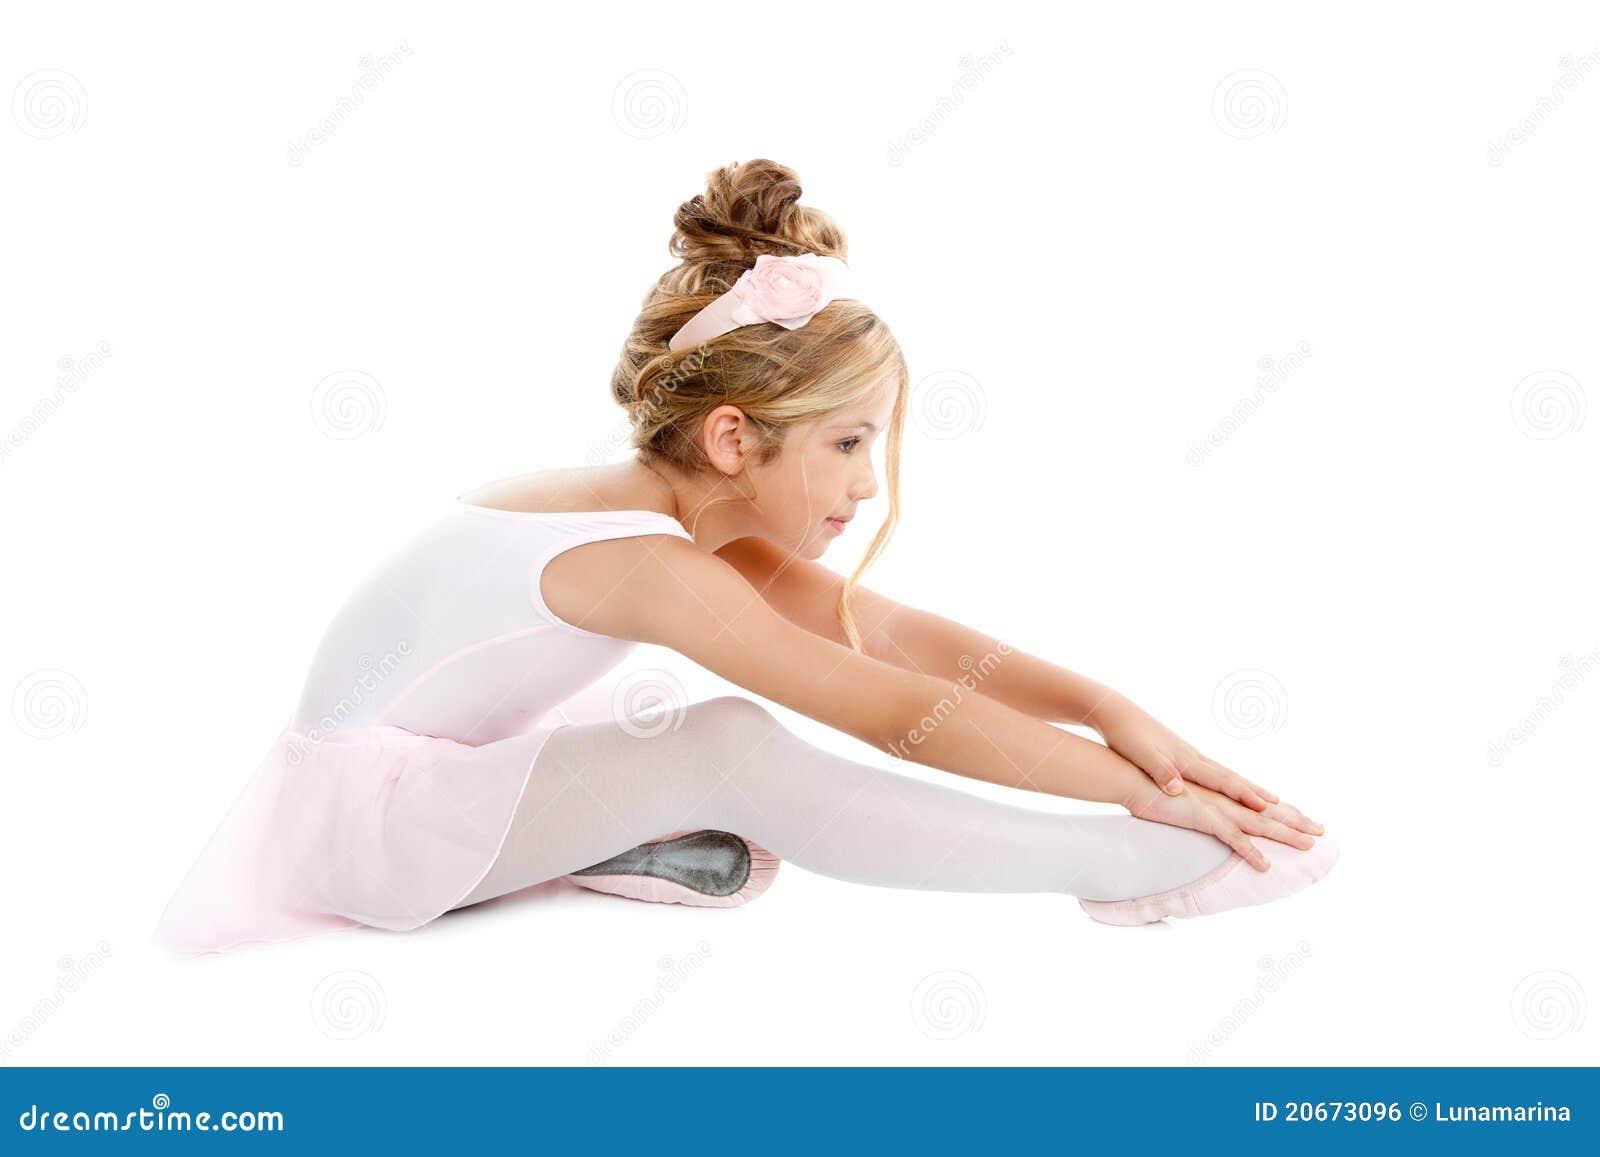 Ballerina Little Ballet Children Stretching Royalty Free Stock Image ...